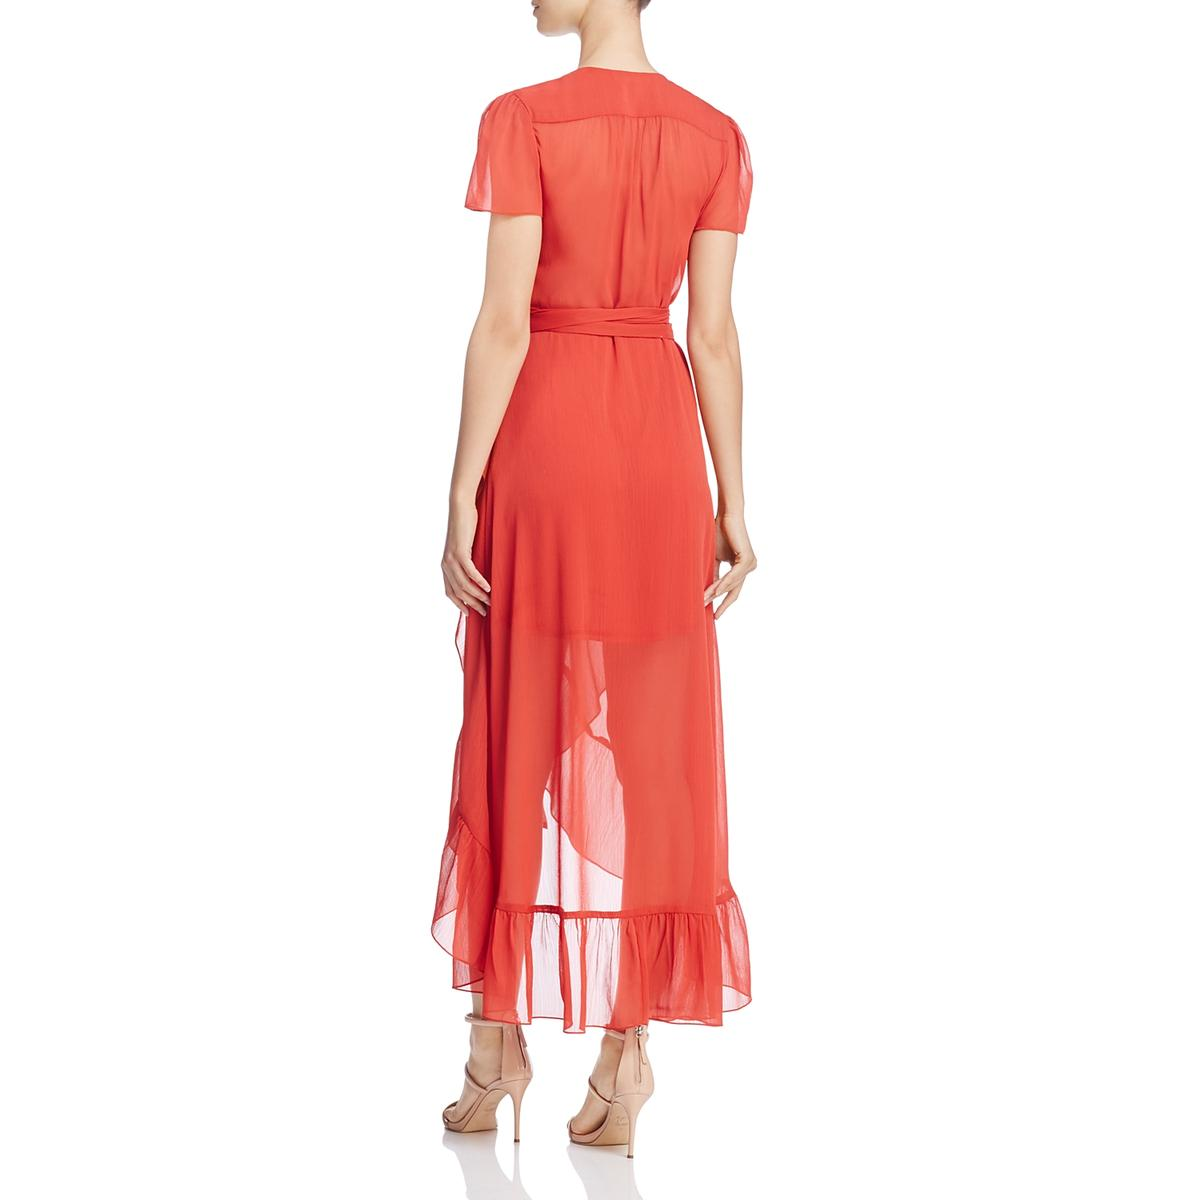 WAYF-Womens-Meryl-Chiffon-Short-Sleeves-Midi-Wrap-Dress-BHFO-2389